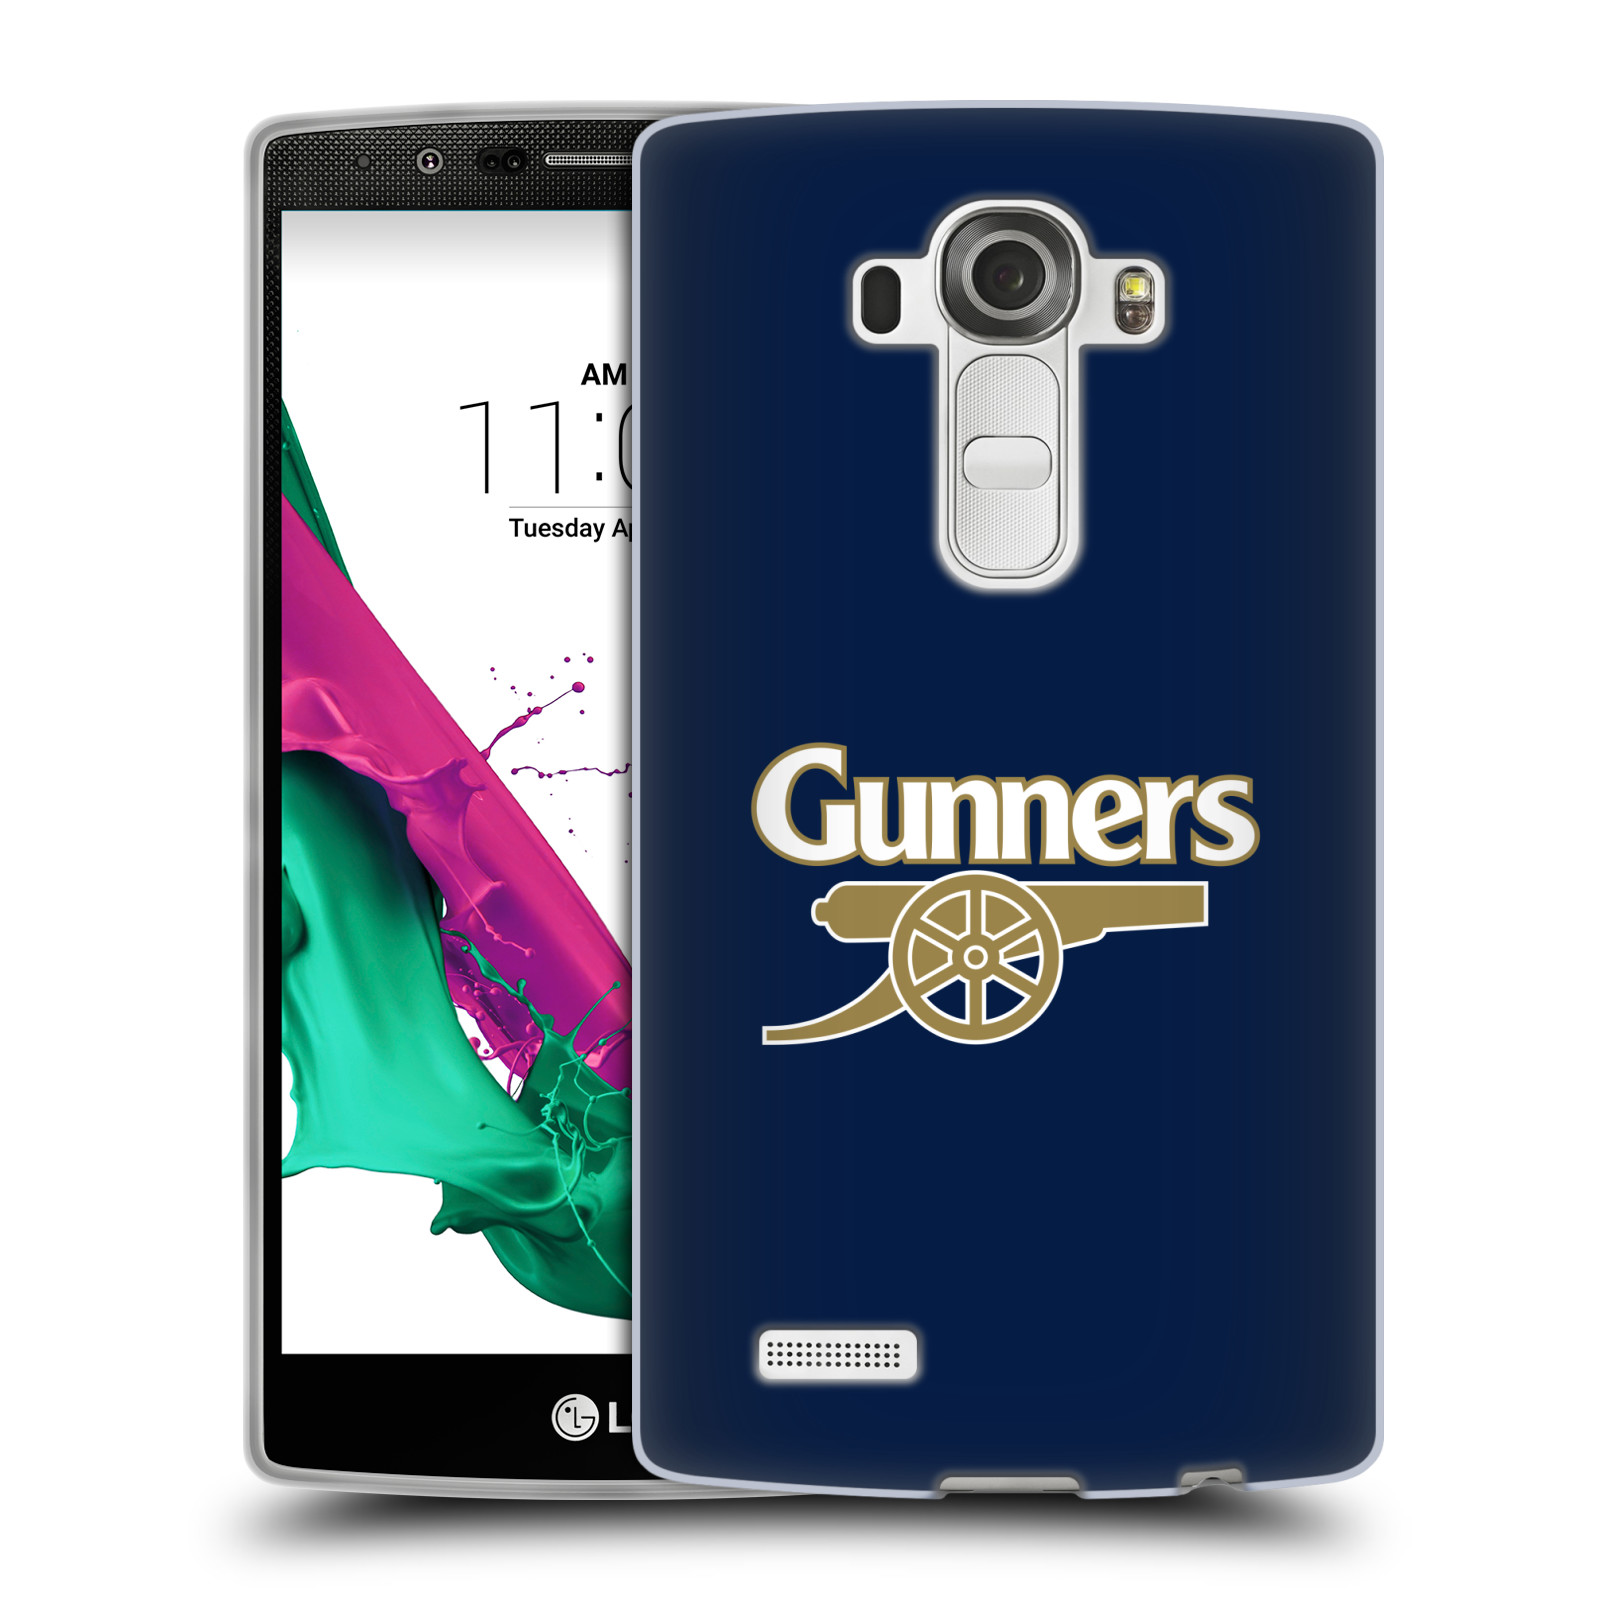 Silikonové pouzdro na mobil LG G4 - Head Case - Arsenal FC - Gunners